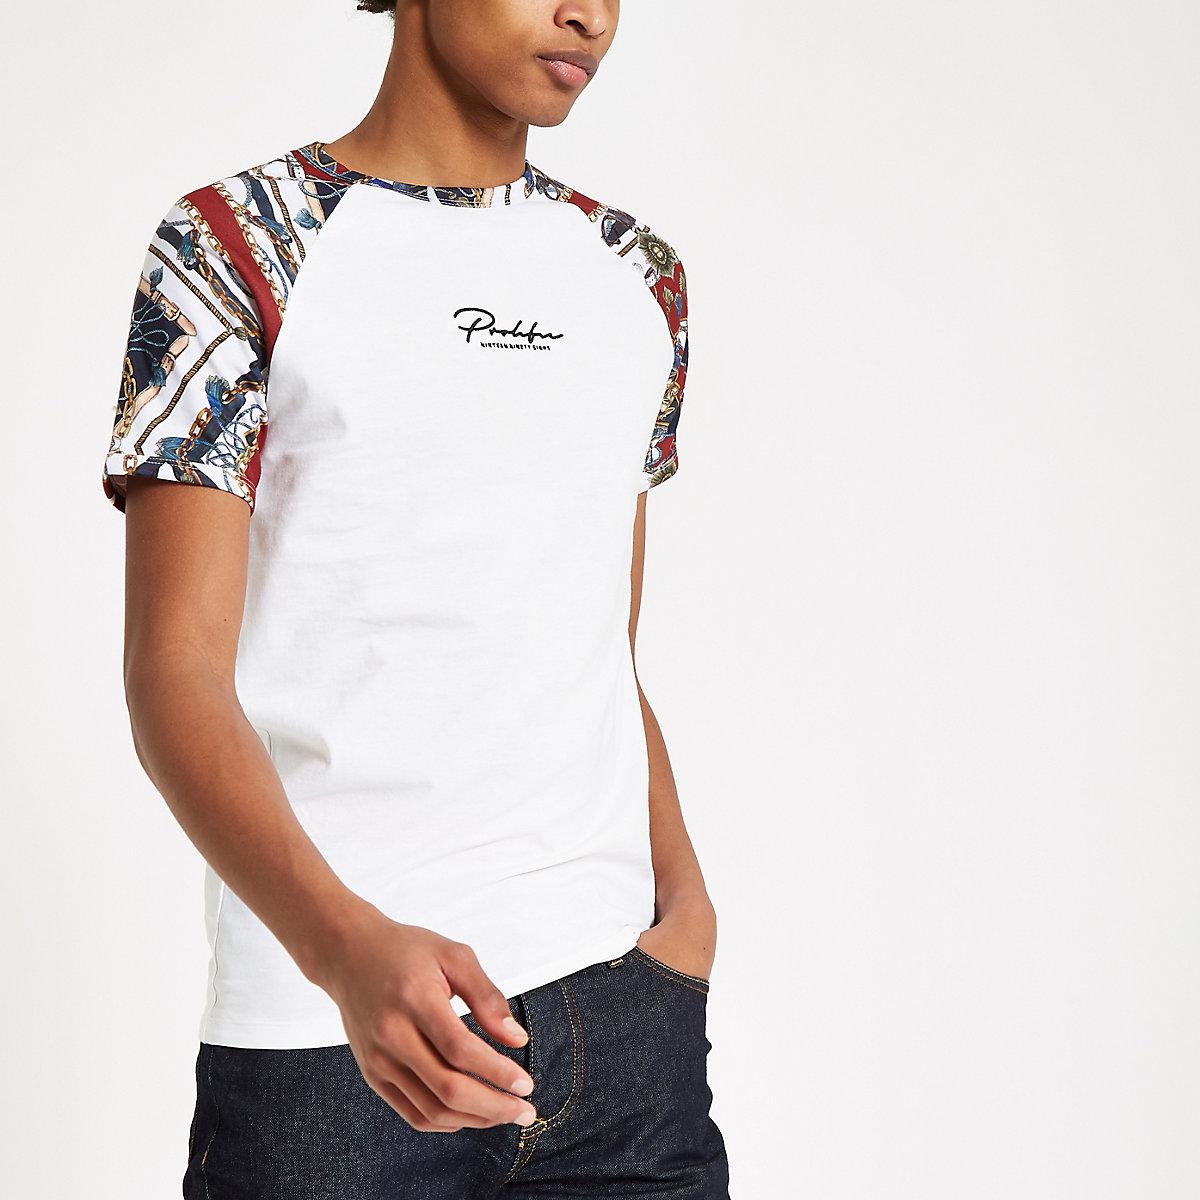 White 'Prolific' raglan muscle fit T-shirt